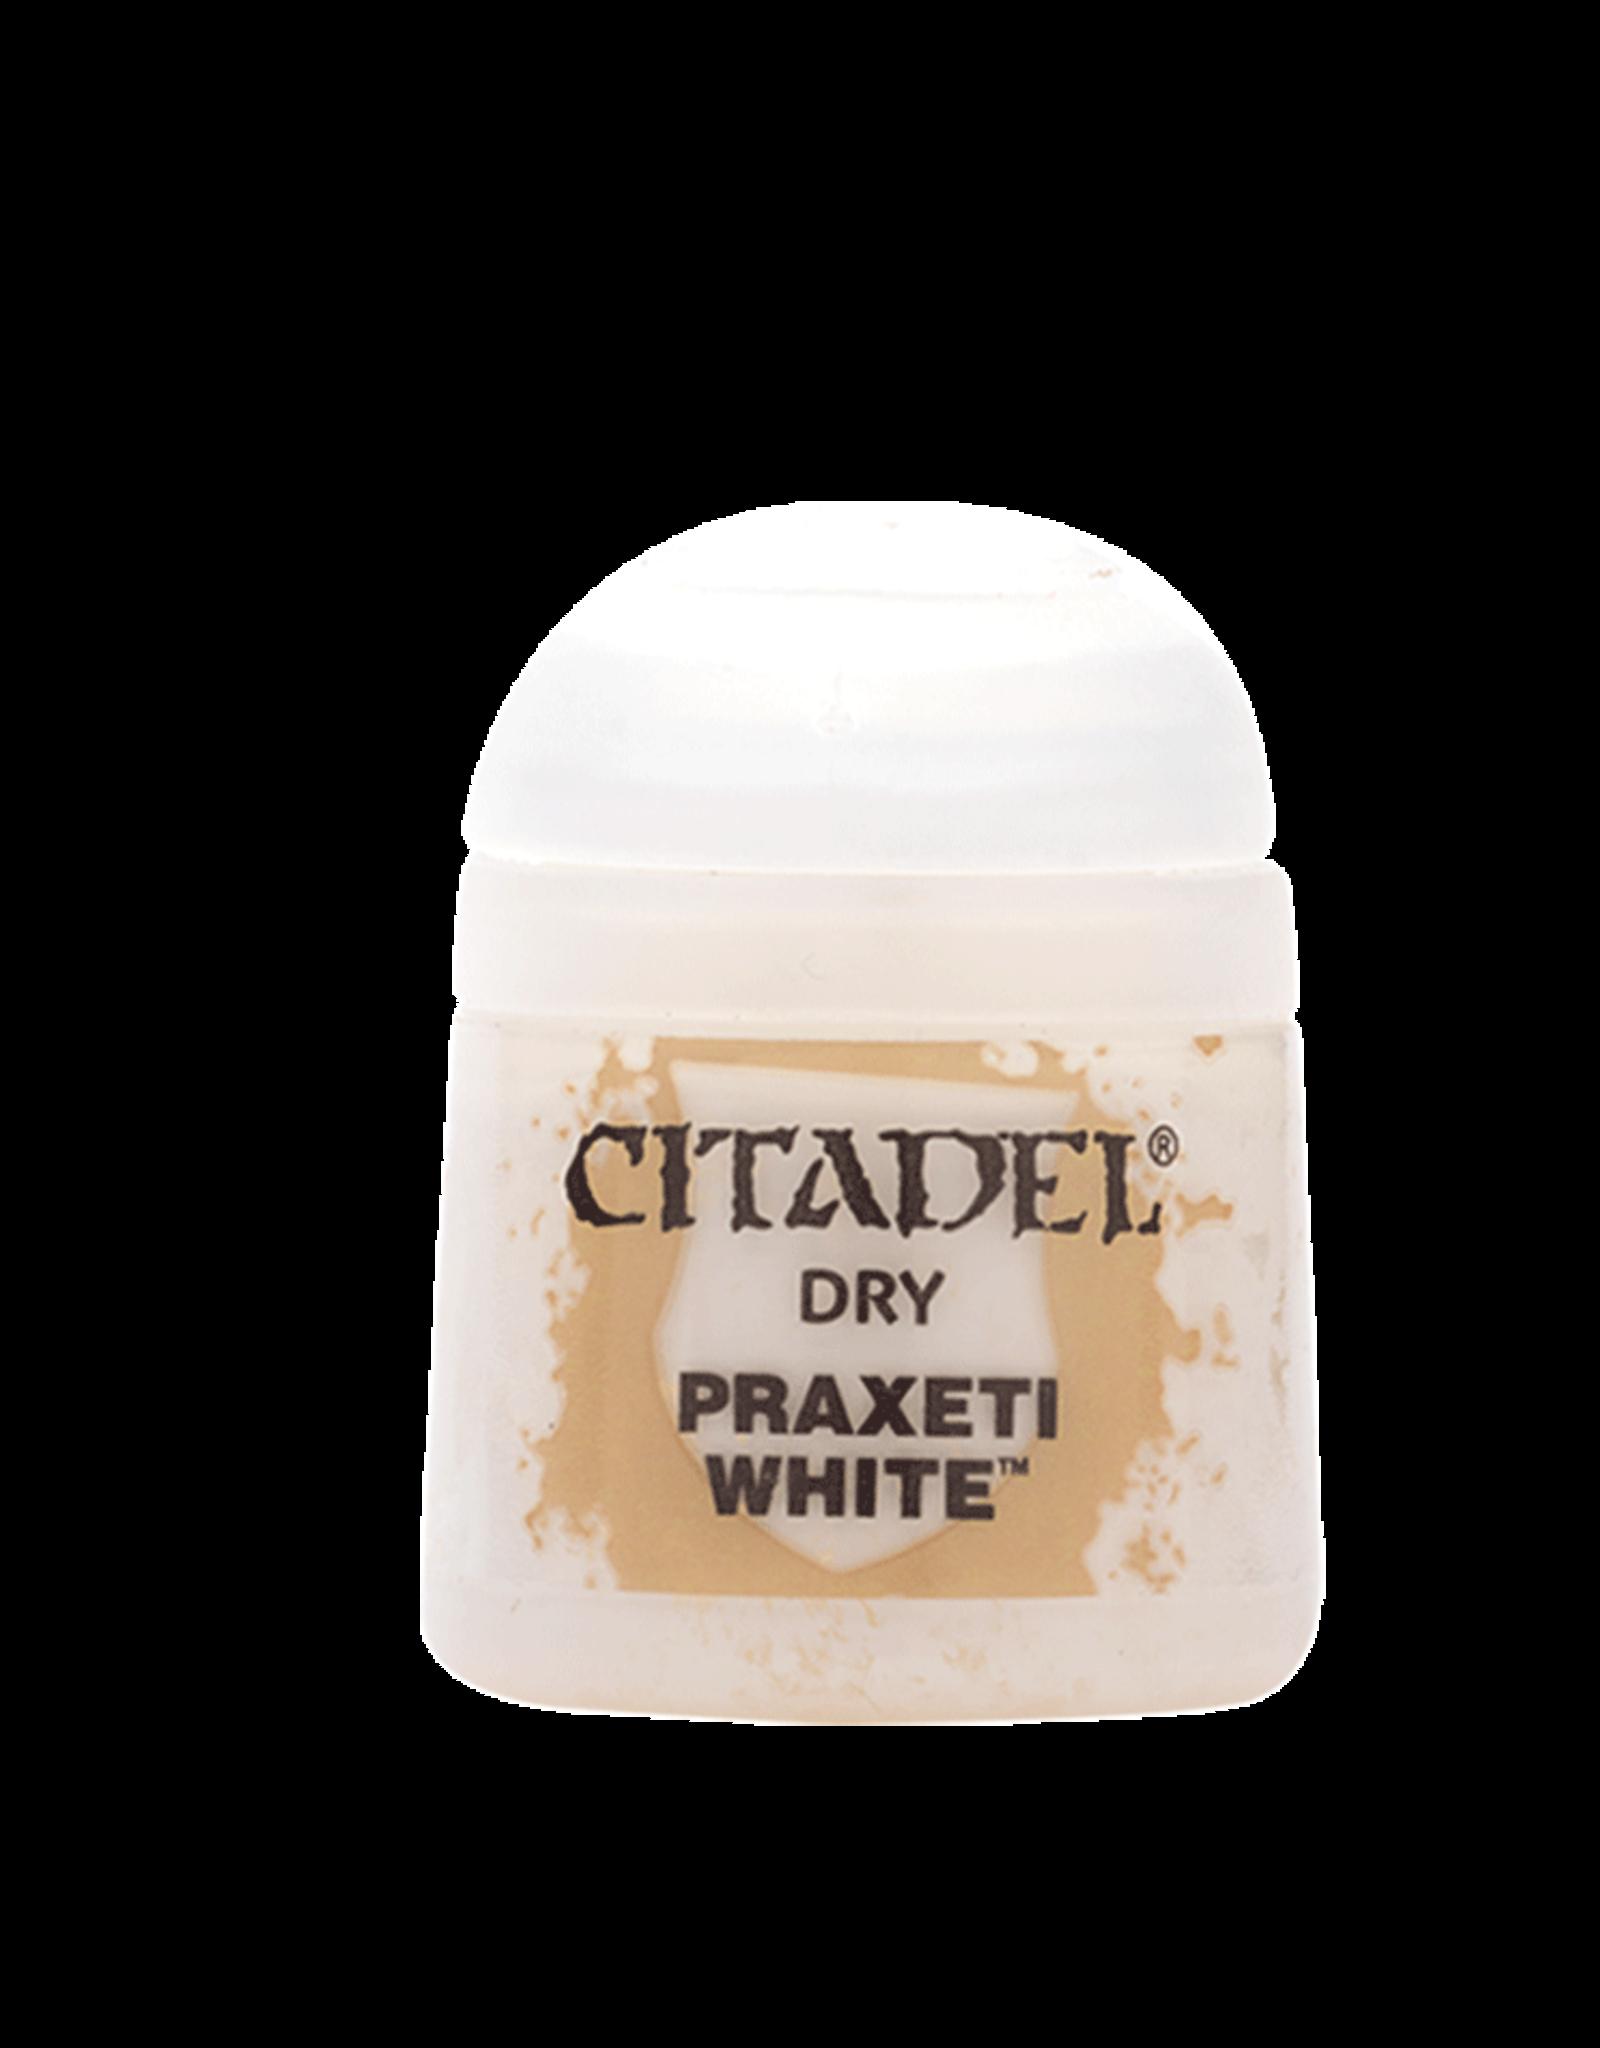 Games Workshop Citadel Dry: Praxeti White